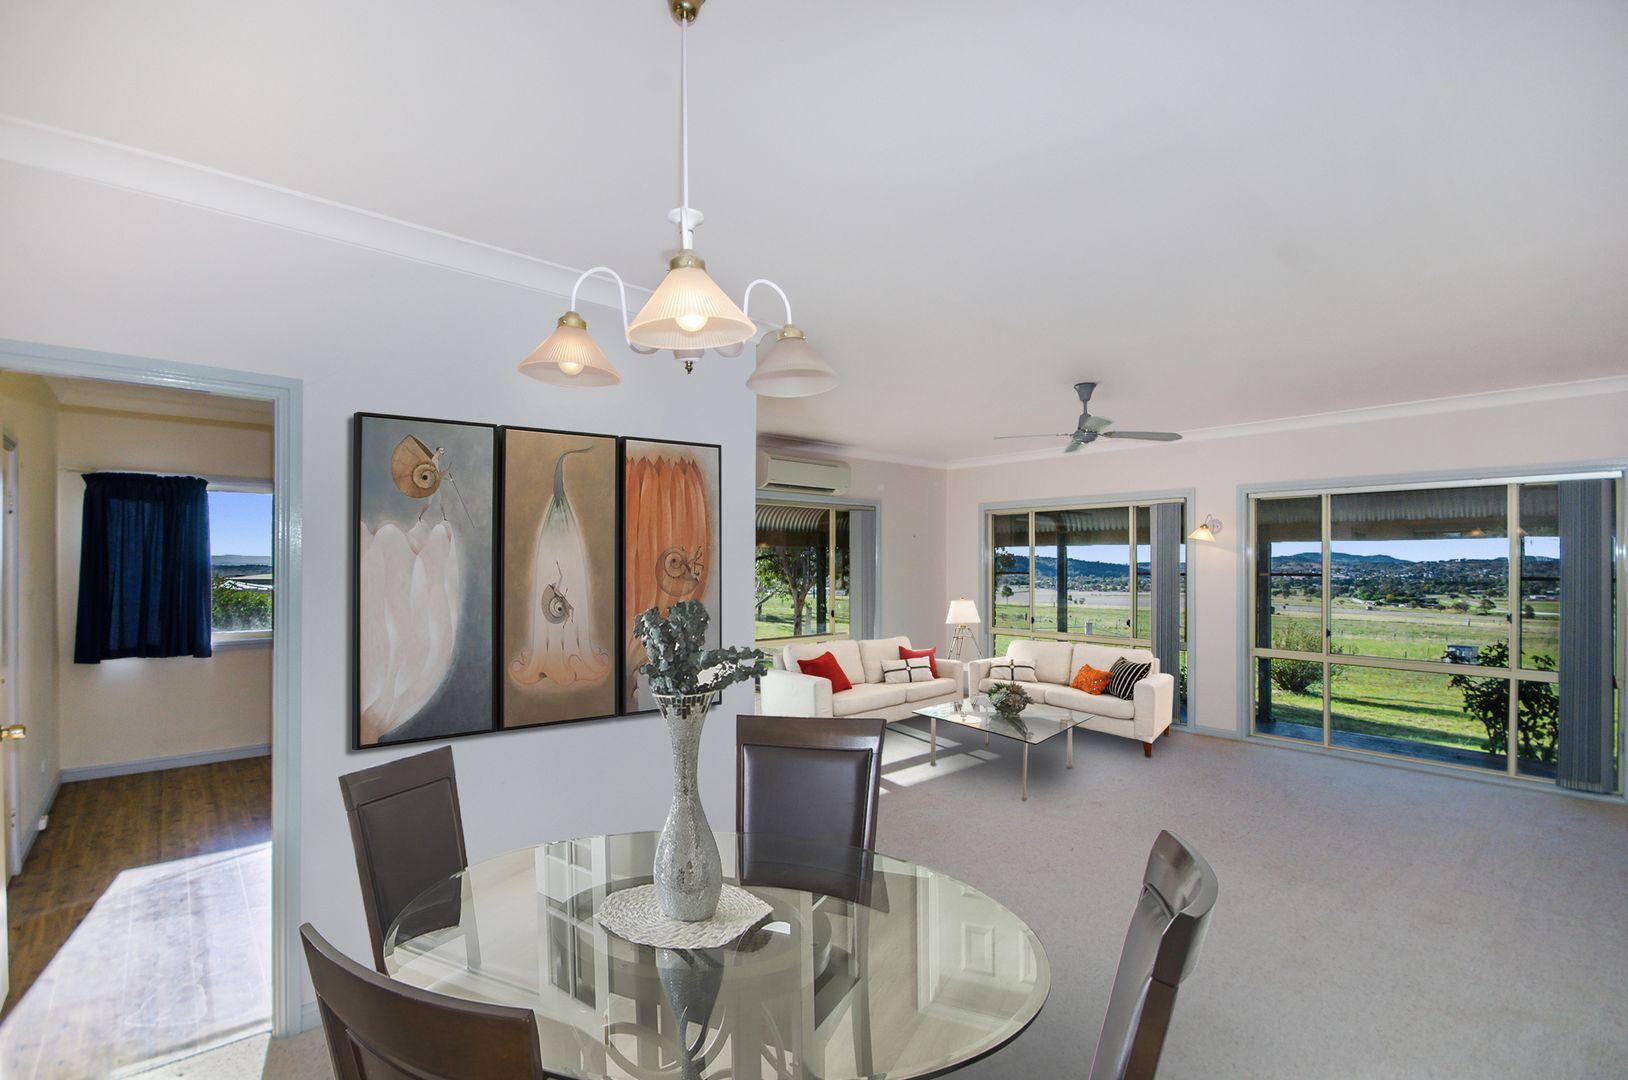 35 Annies Lane, Quirindi NSW 2343, Image 1